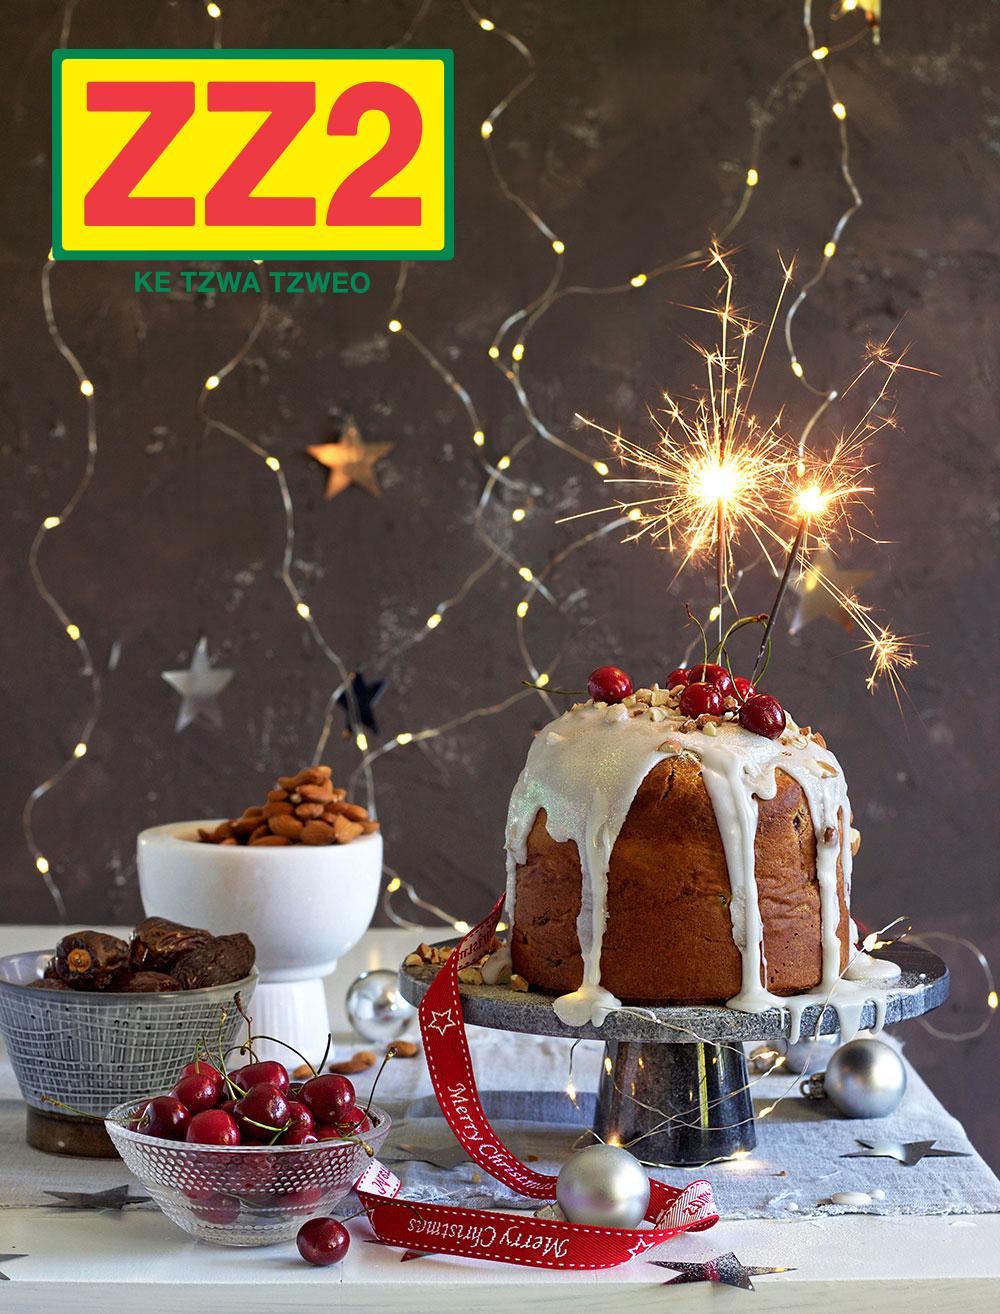 ZZ2 Festive Fruit Cake